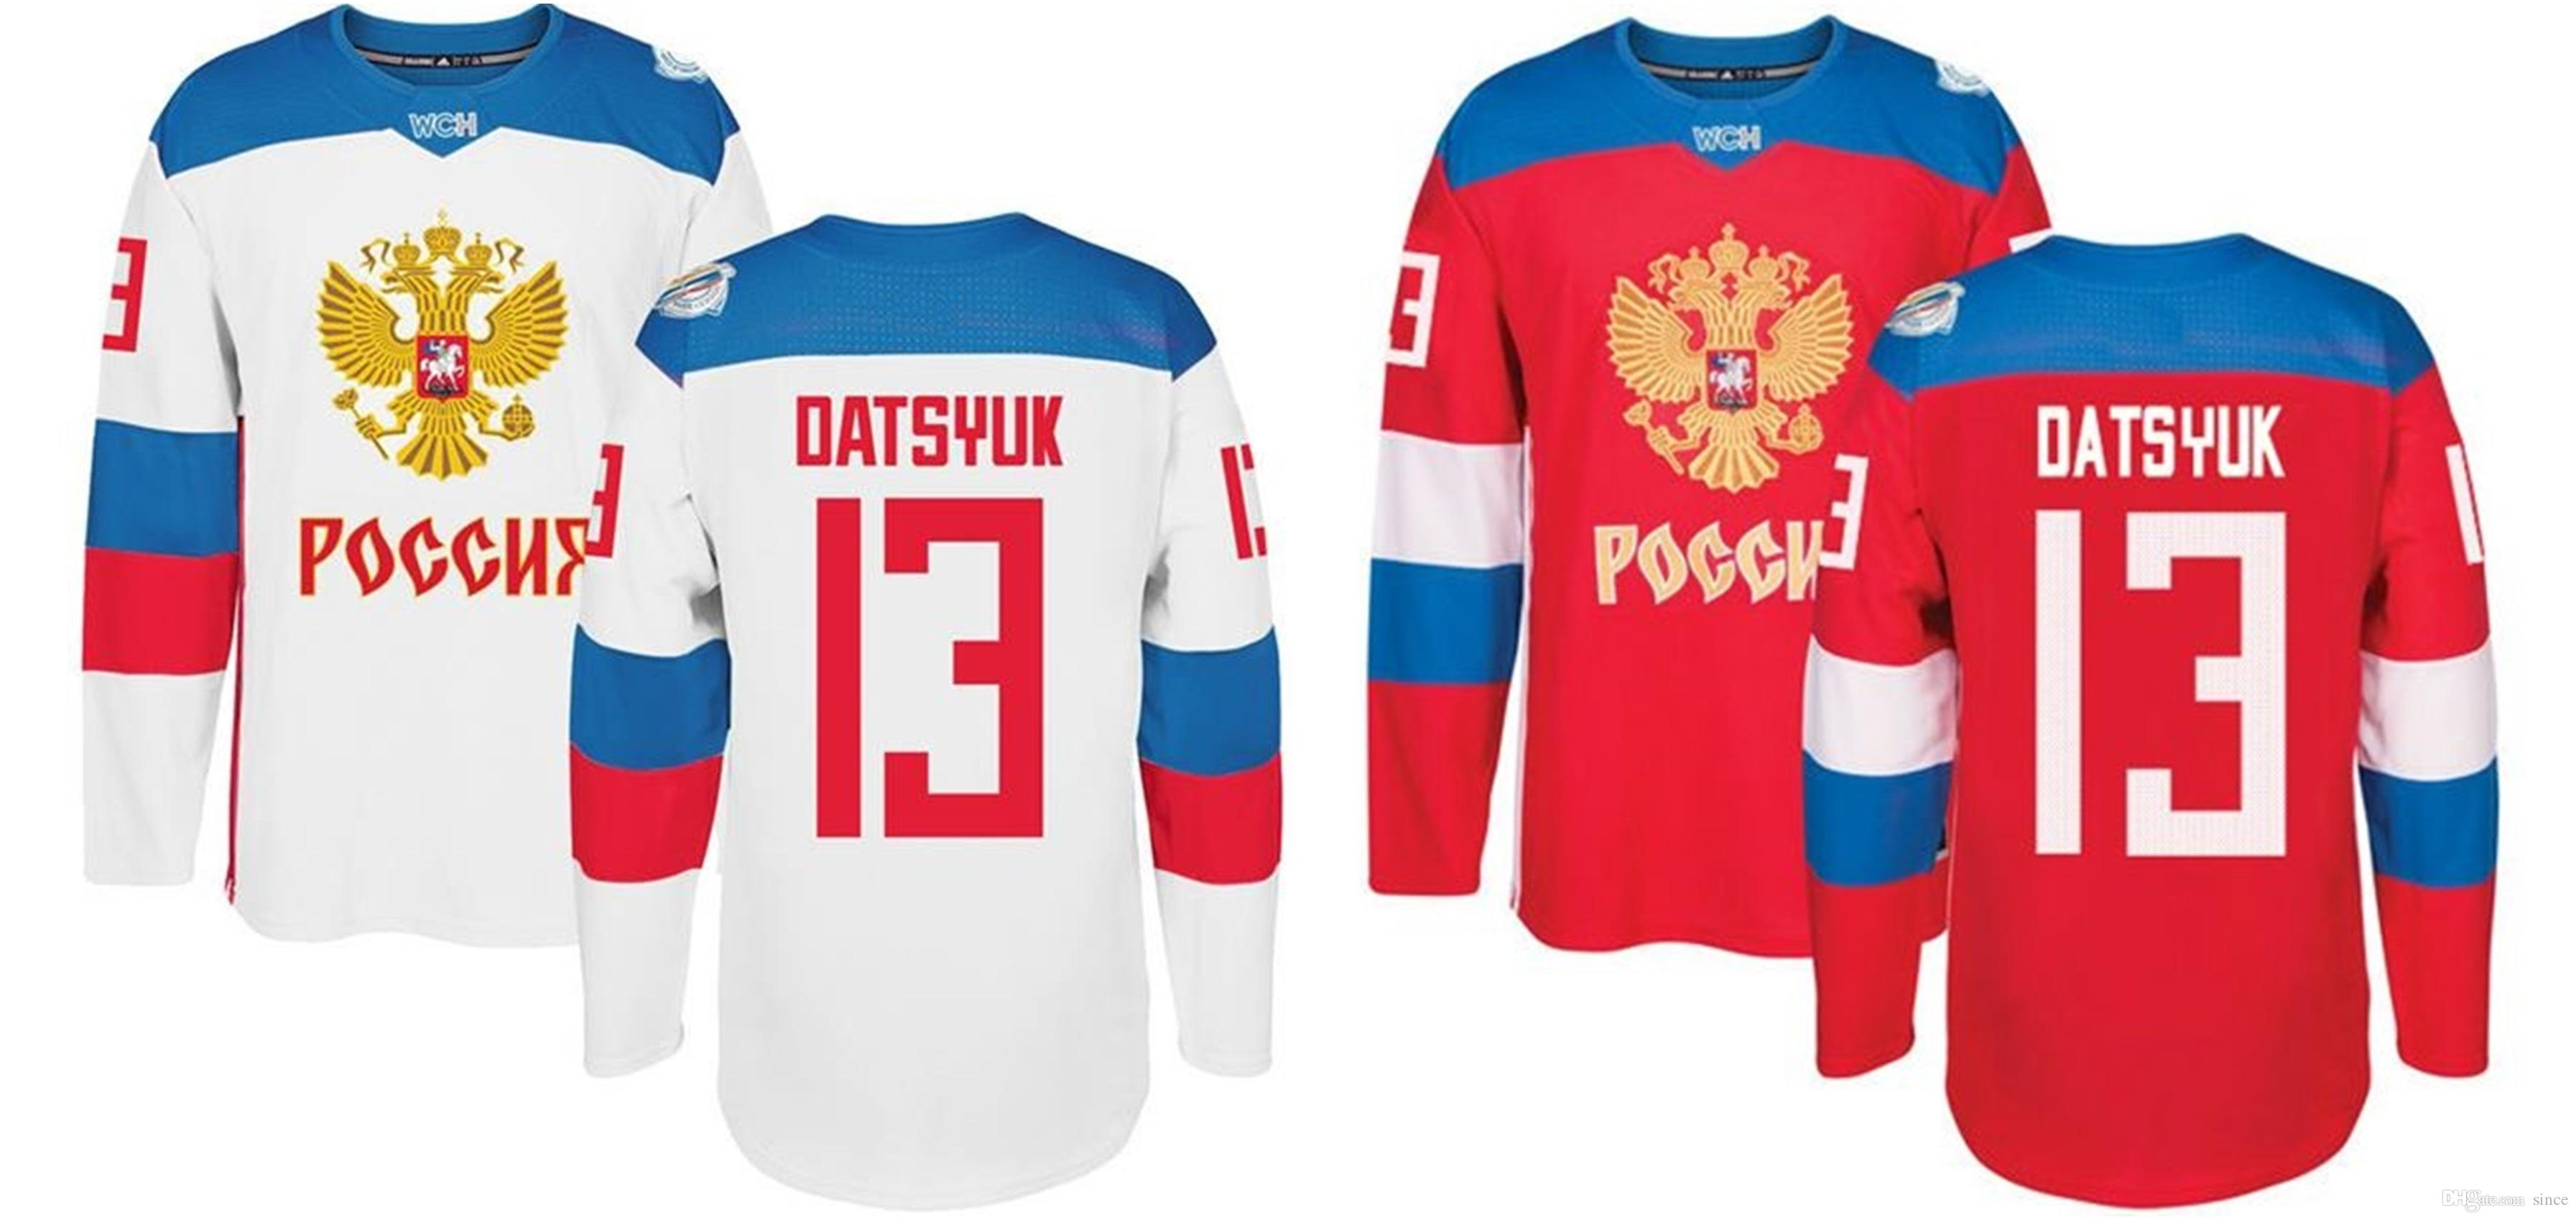 super popular 57c6f 4bc4b 2016 New 2014 Olympics Team Russia 13 Pavel Datsyuk Red White 2016 World  Cup Of Hockey Premier Player Ice Hockey Jerseys